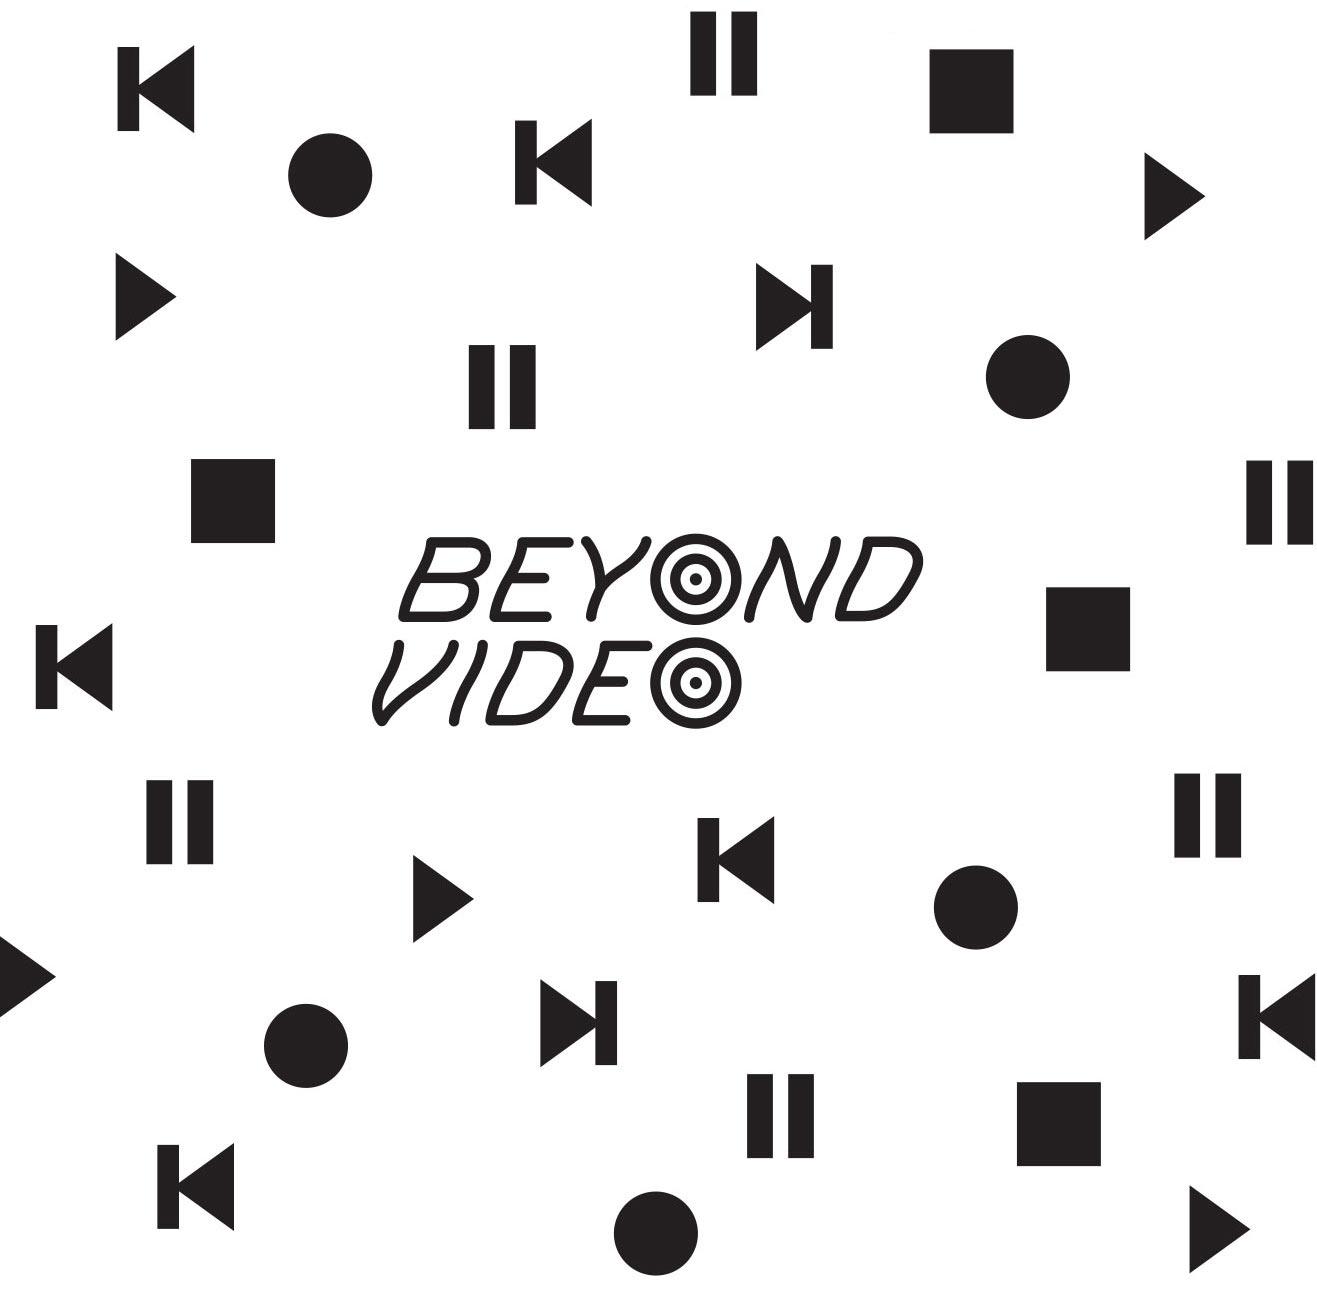 Beyond_Video_logo_pattern2.jpg